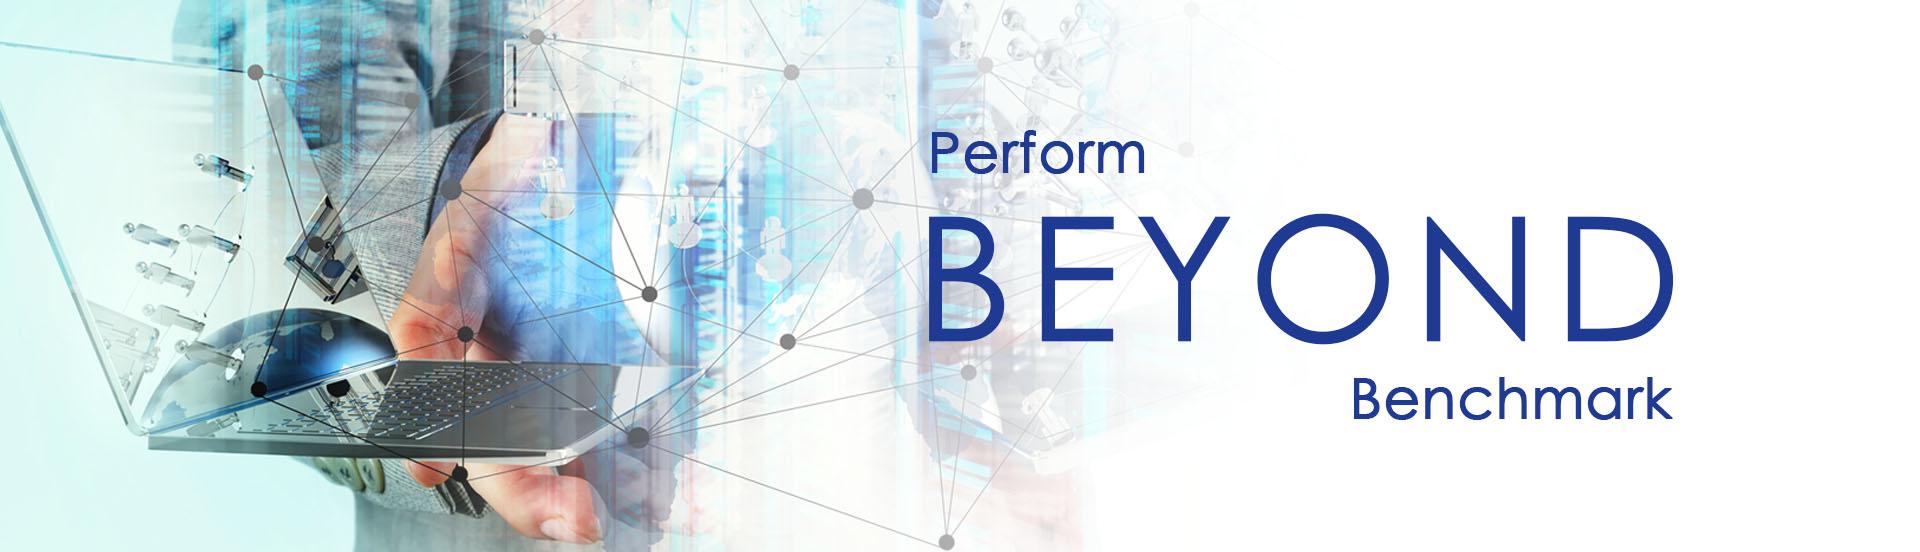 header reads perform beyond benchmark